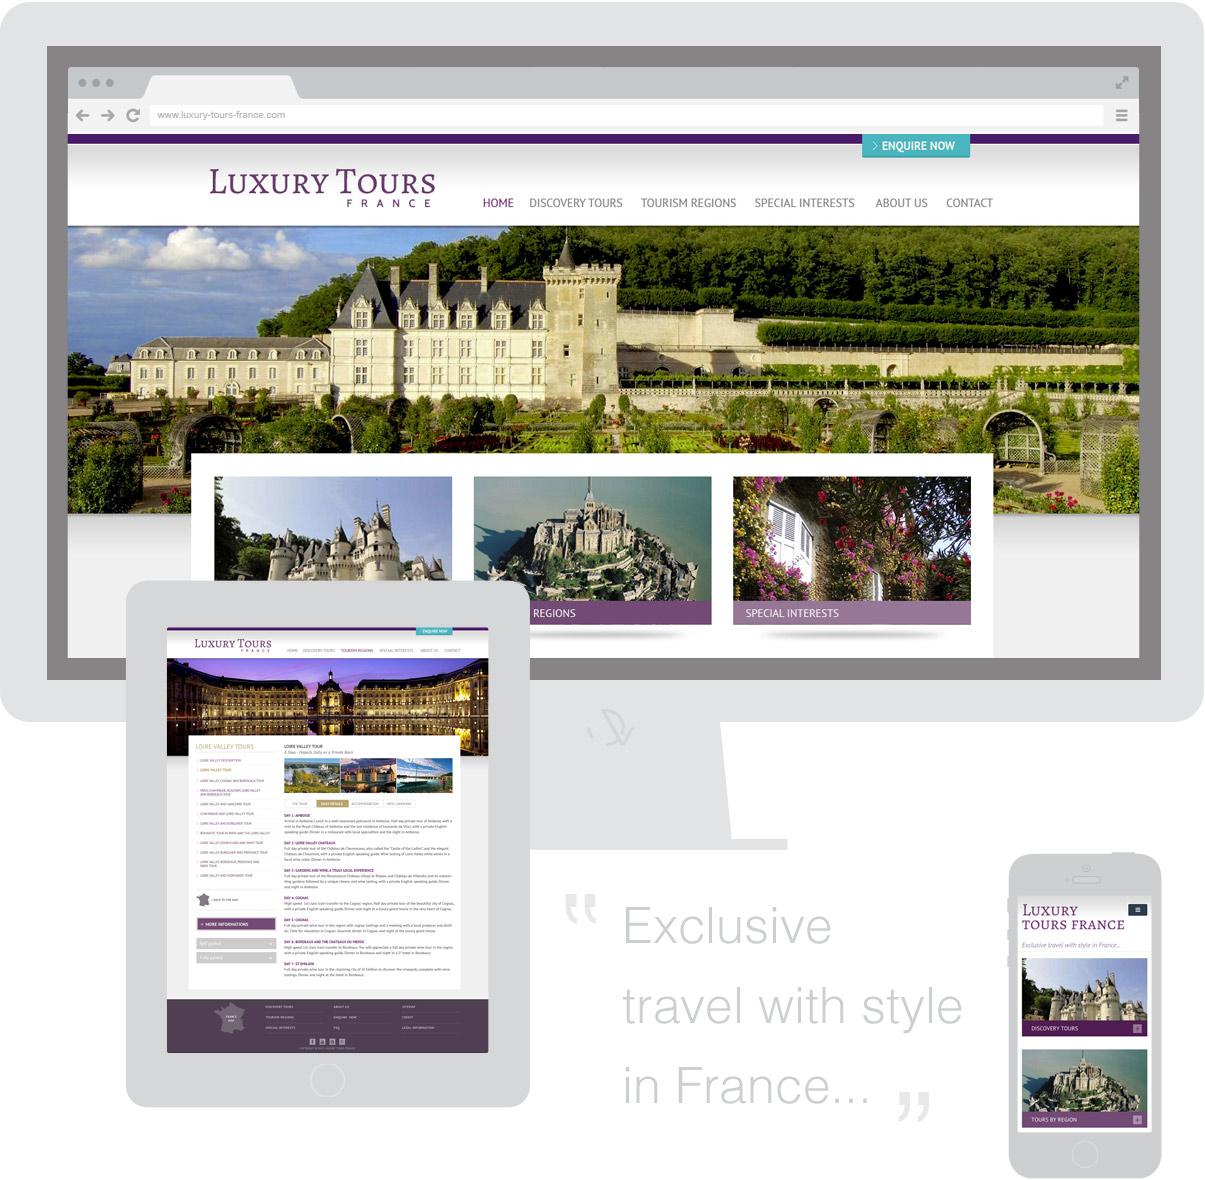 Luxury Tours France - Site internet - Homepage - Mobiles - Tourisme - Val de Loire - © ovarma.com